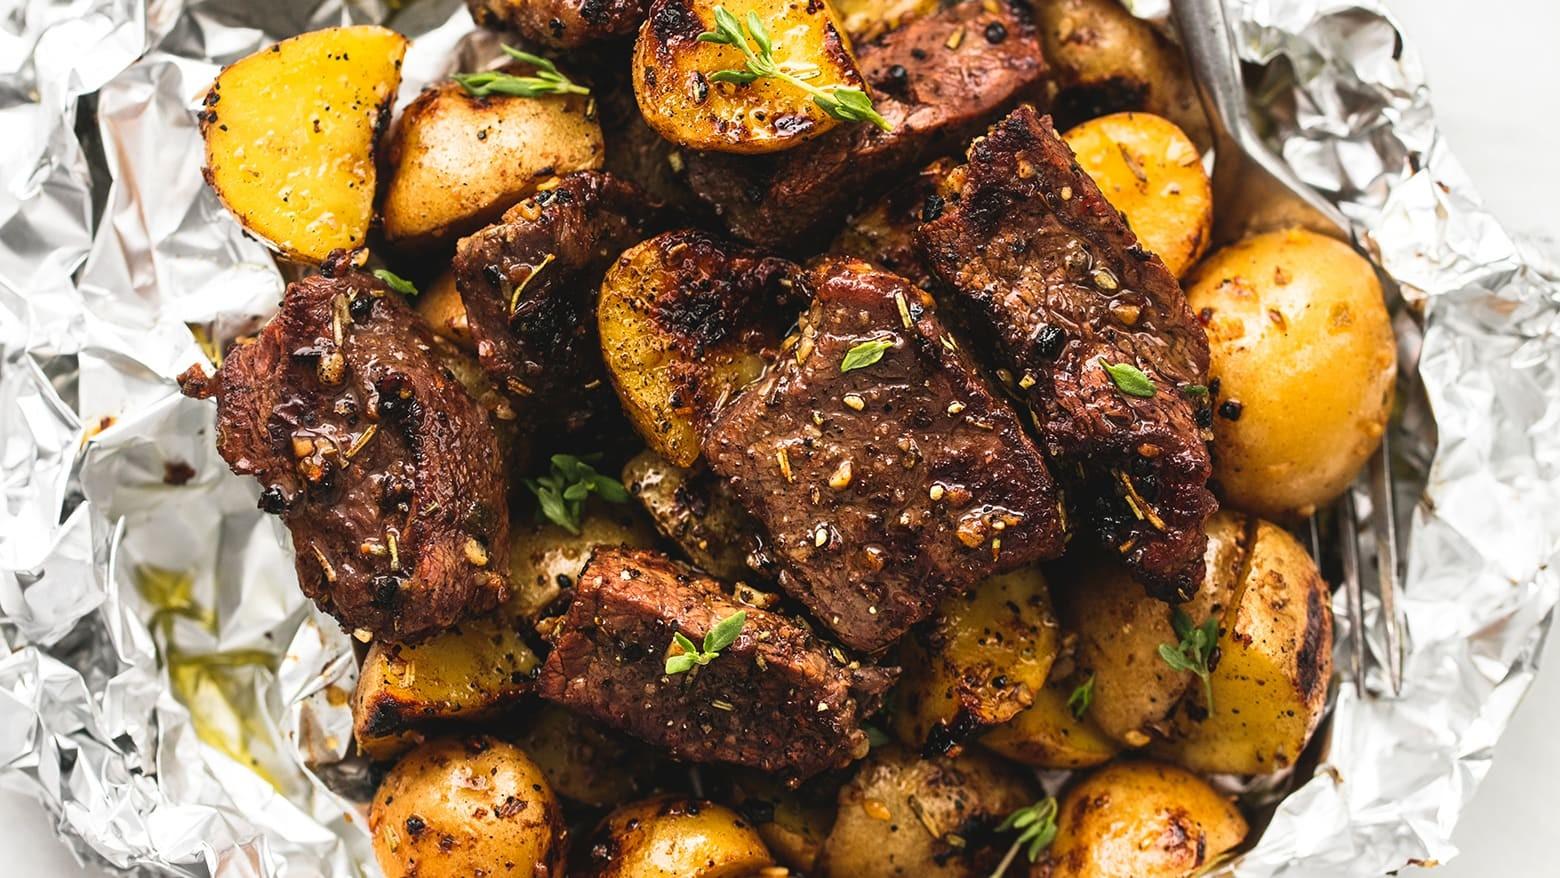 Meat in oven in foil